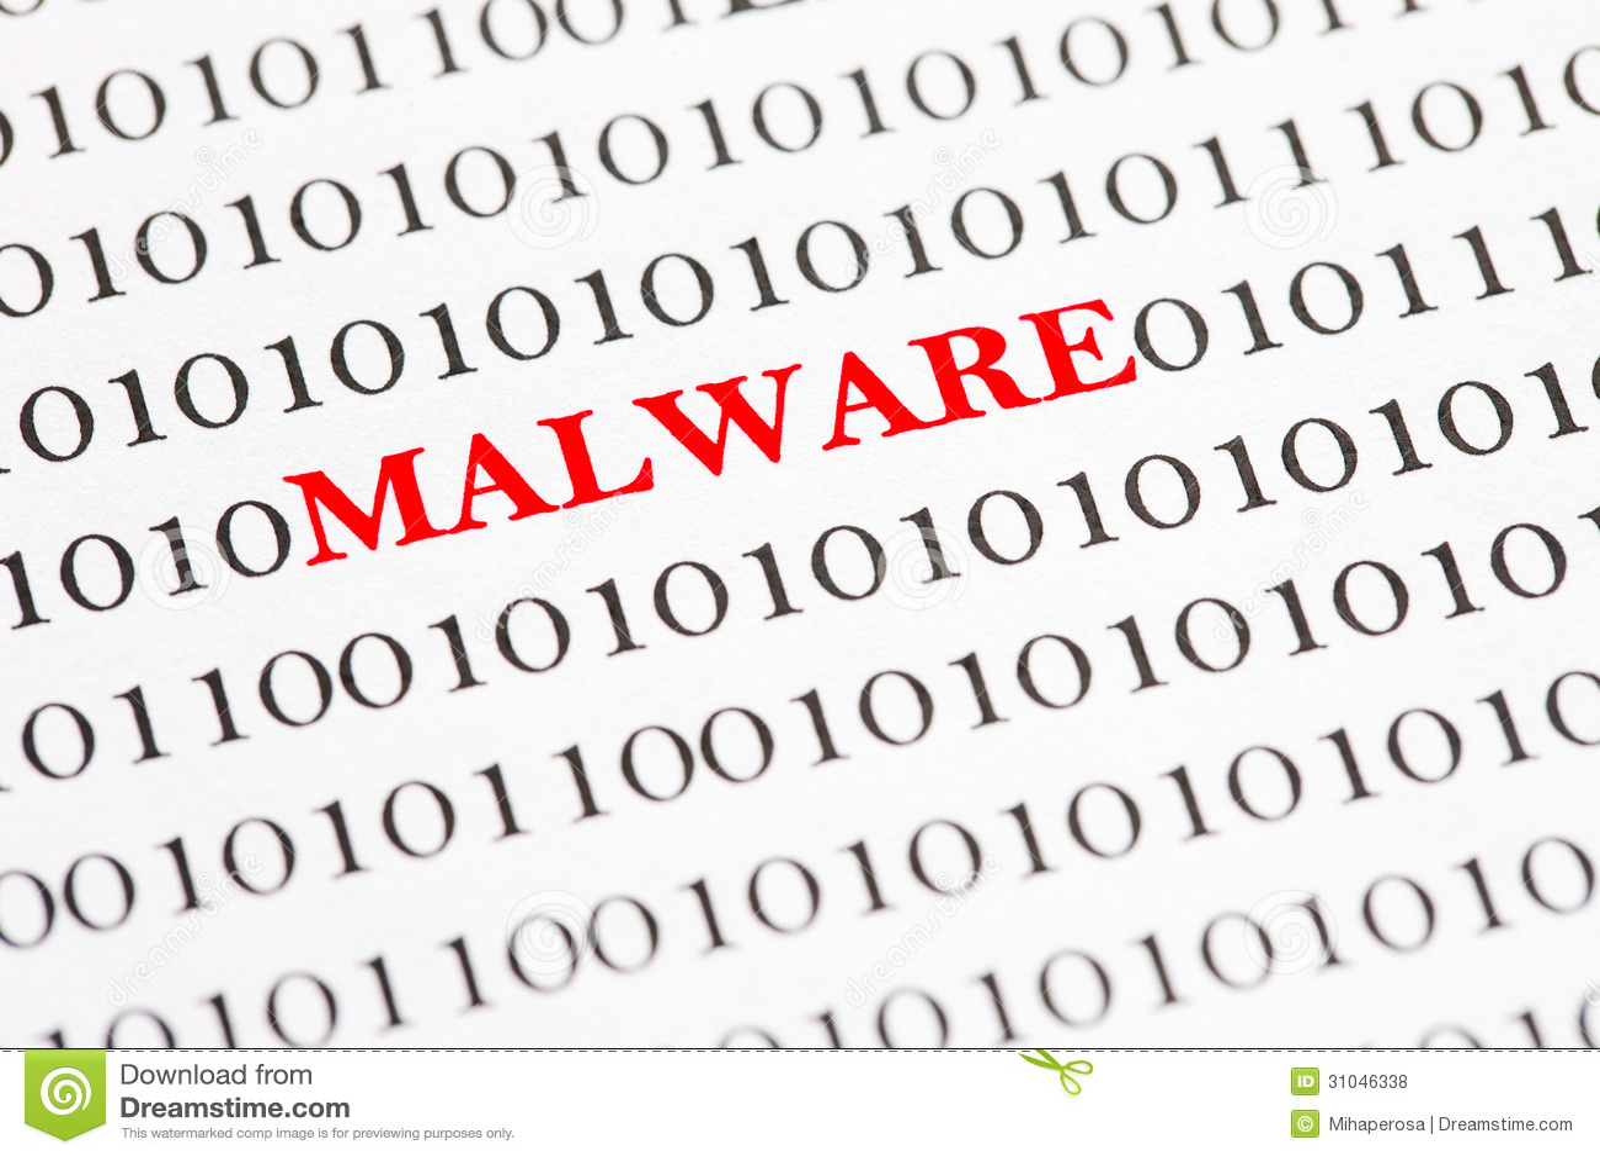 Malware en código binario